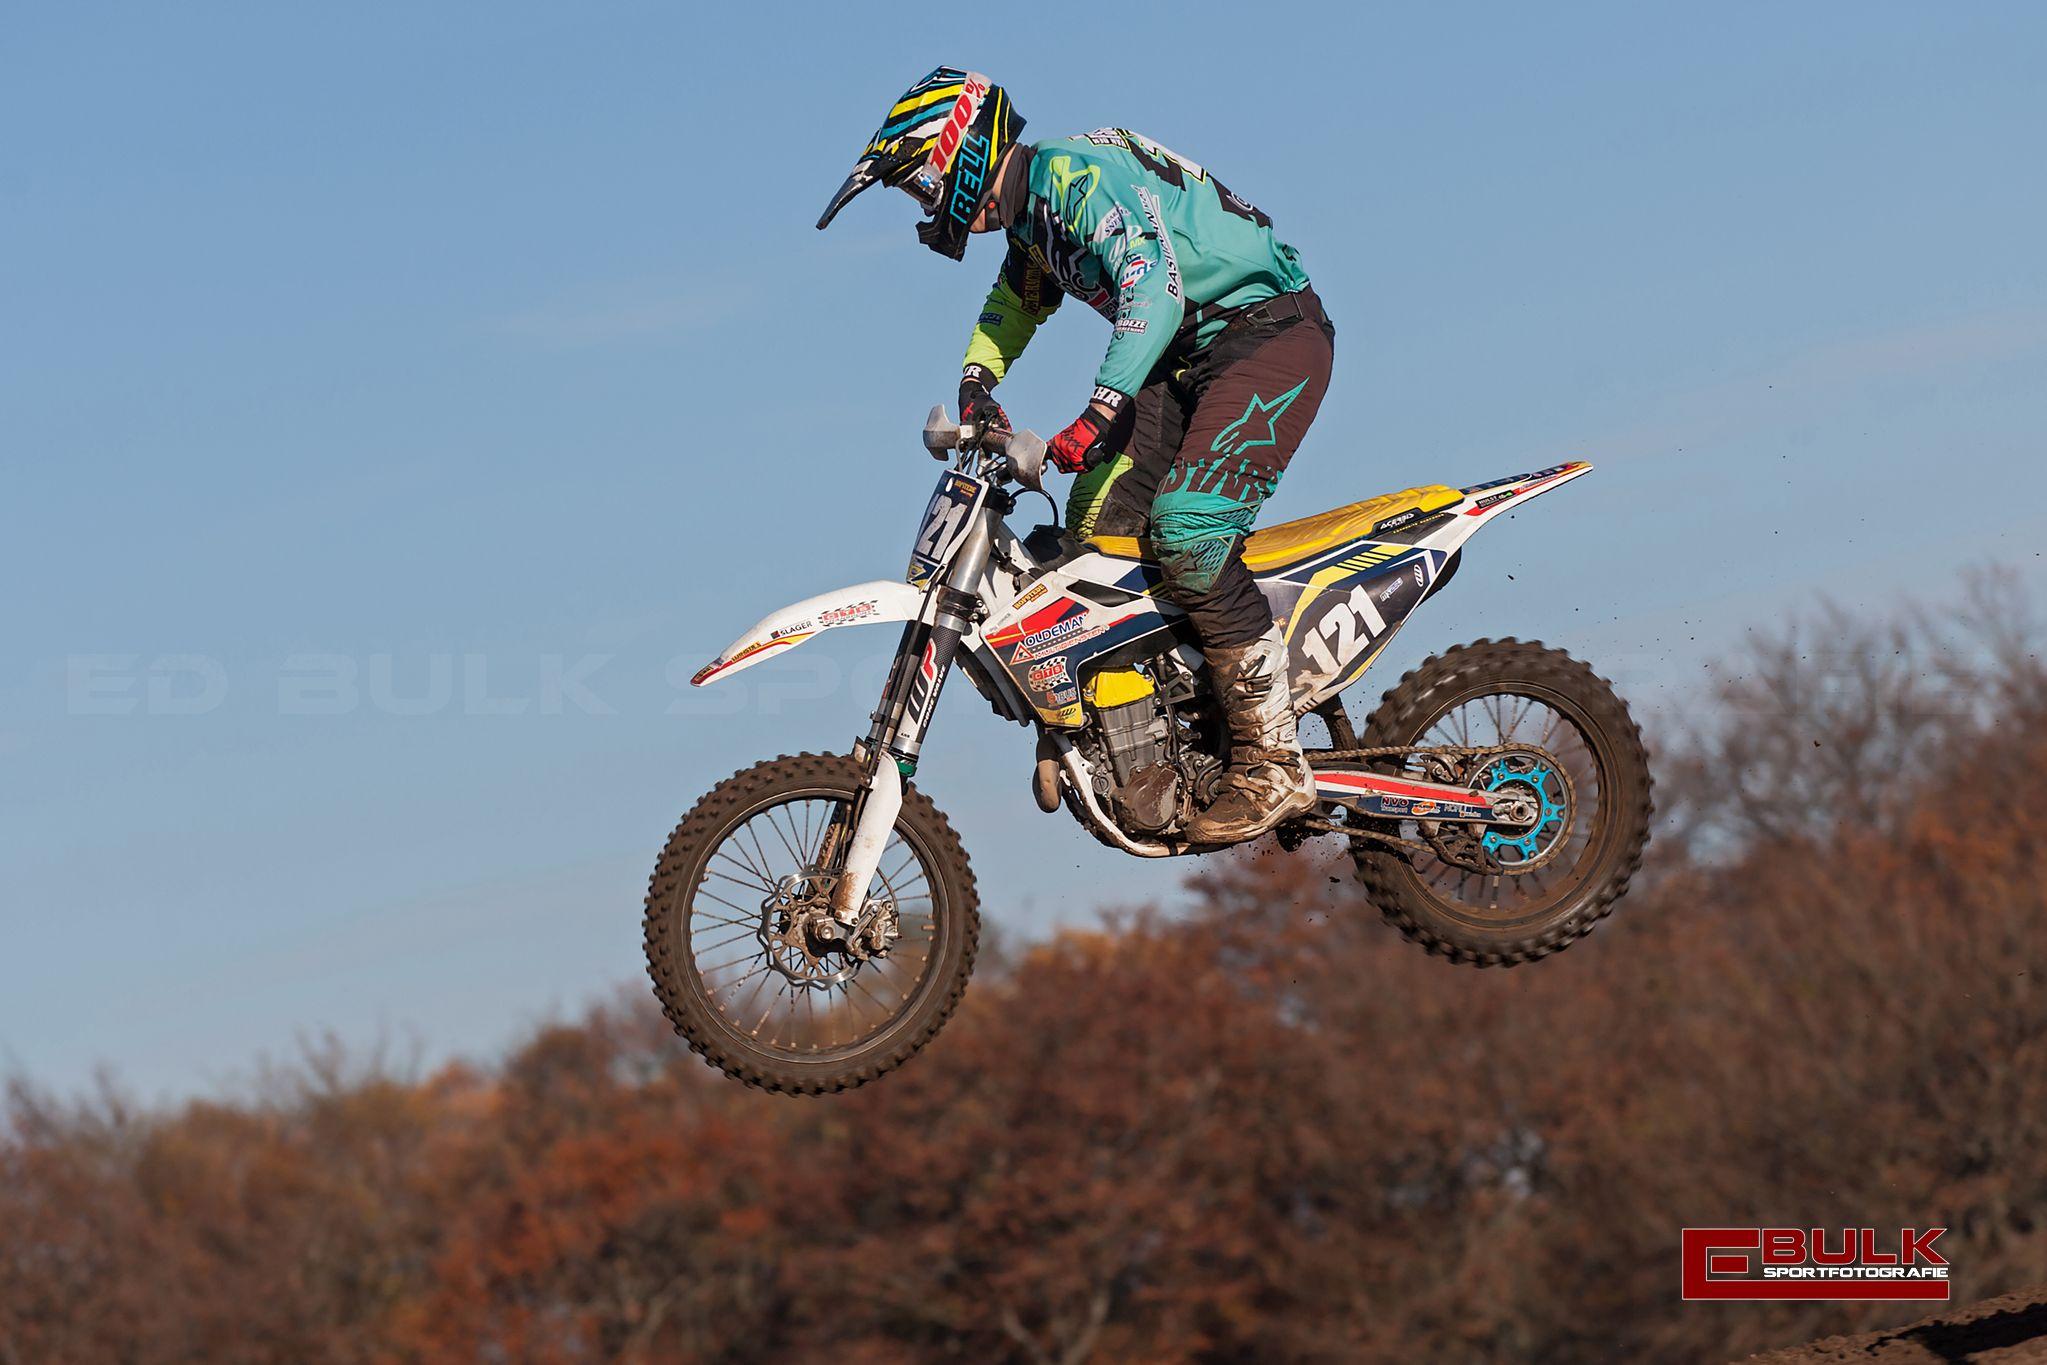 ebs_0729-ed_bulk_sportfotografie